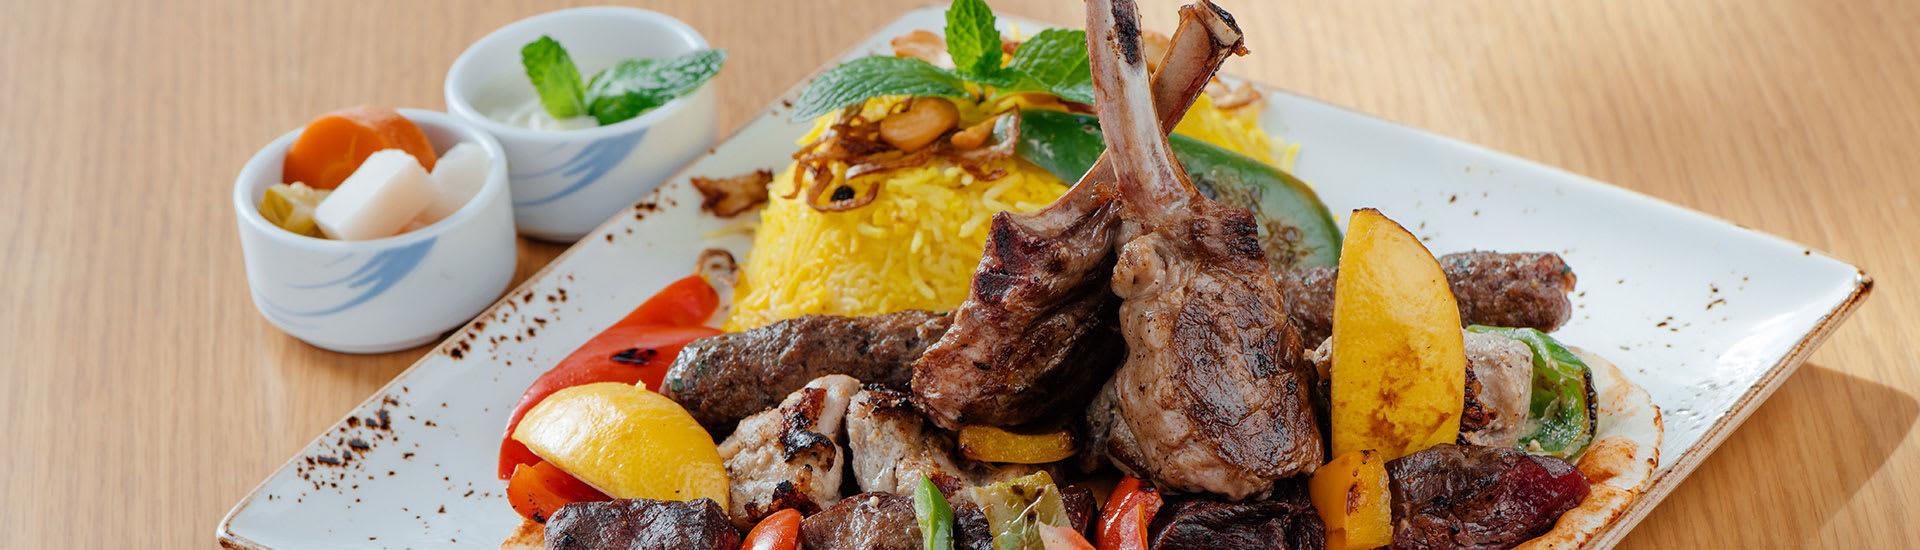 Delicious Dish at Sakalan Restaurant Anantara Salalah Oman